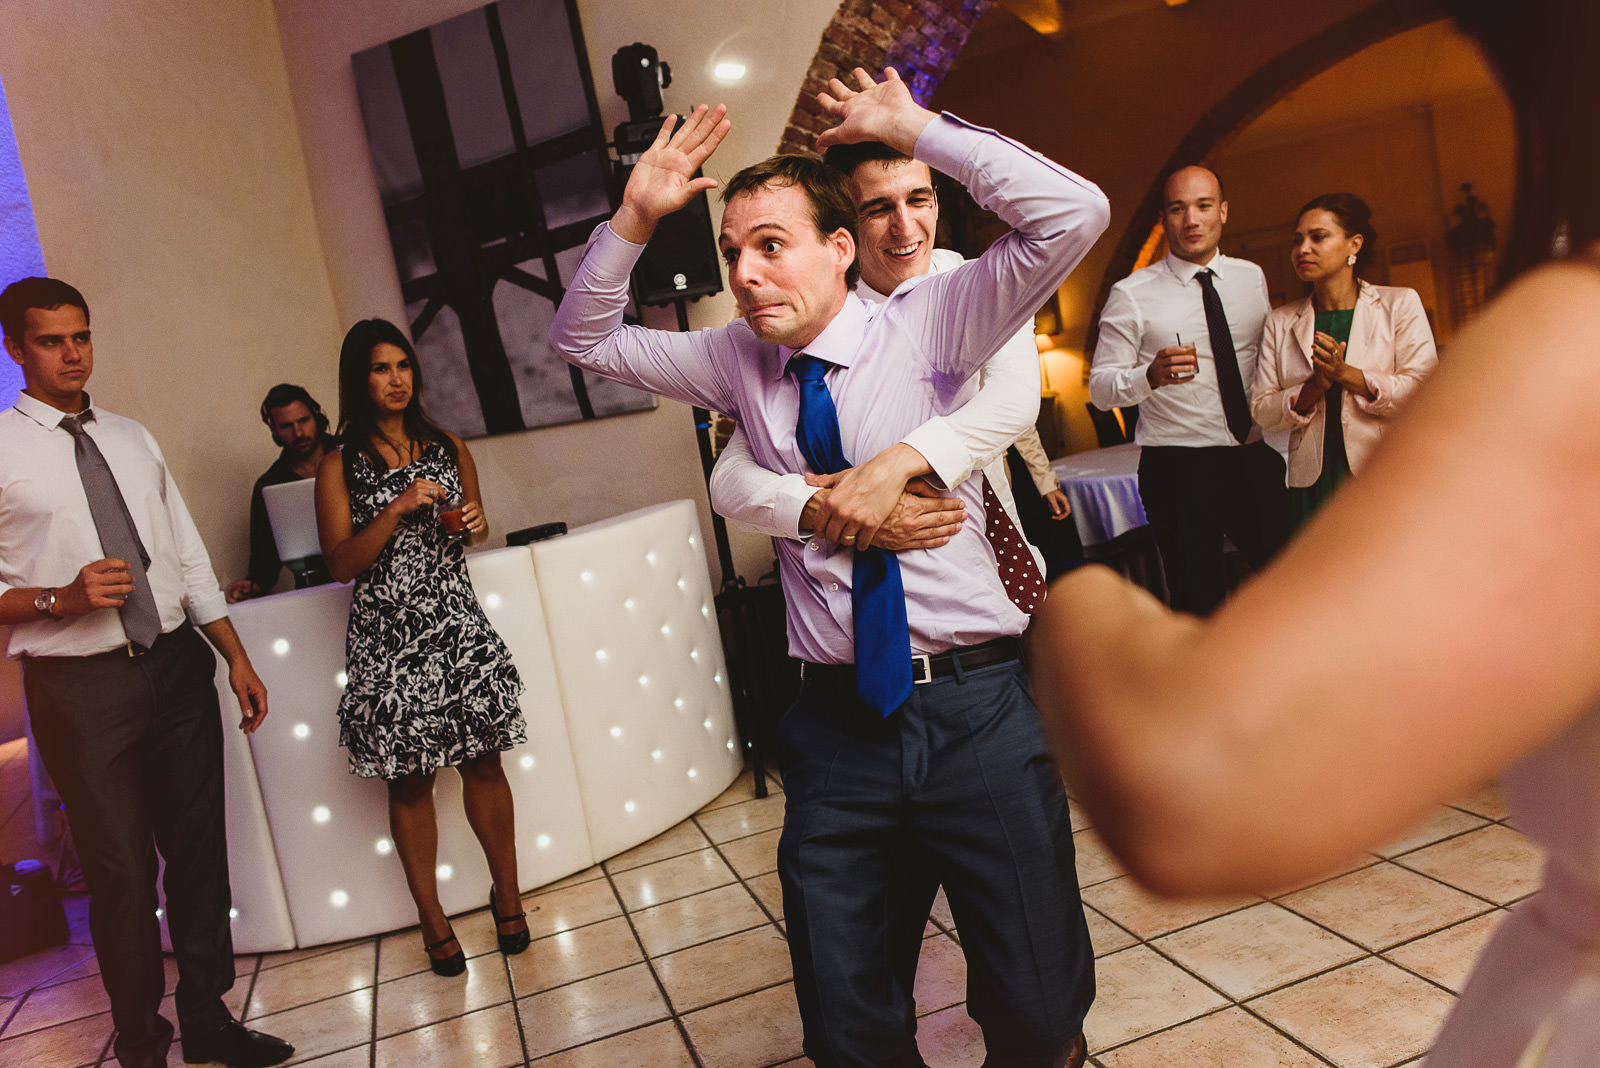 destination-wedding-france-melbor-103